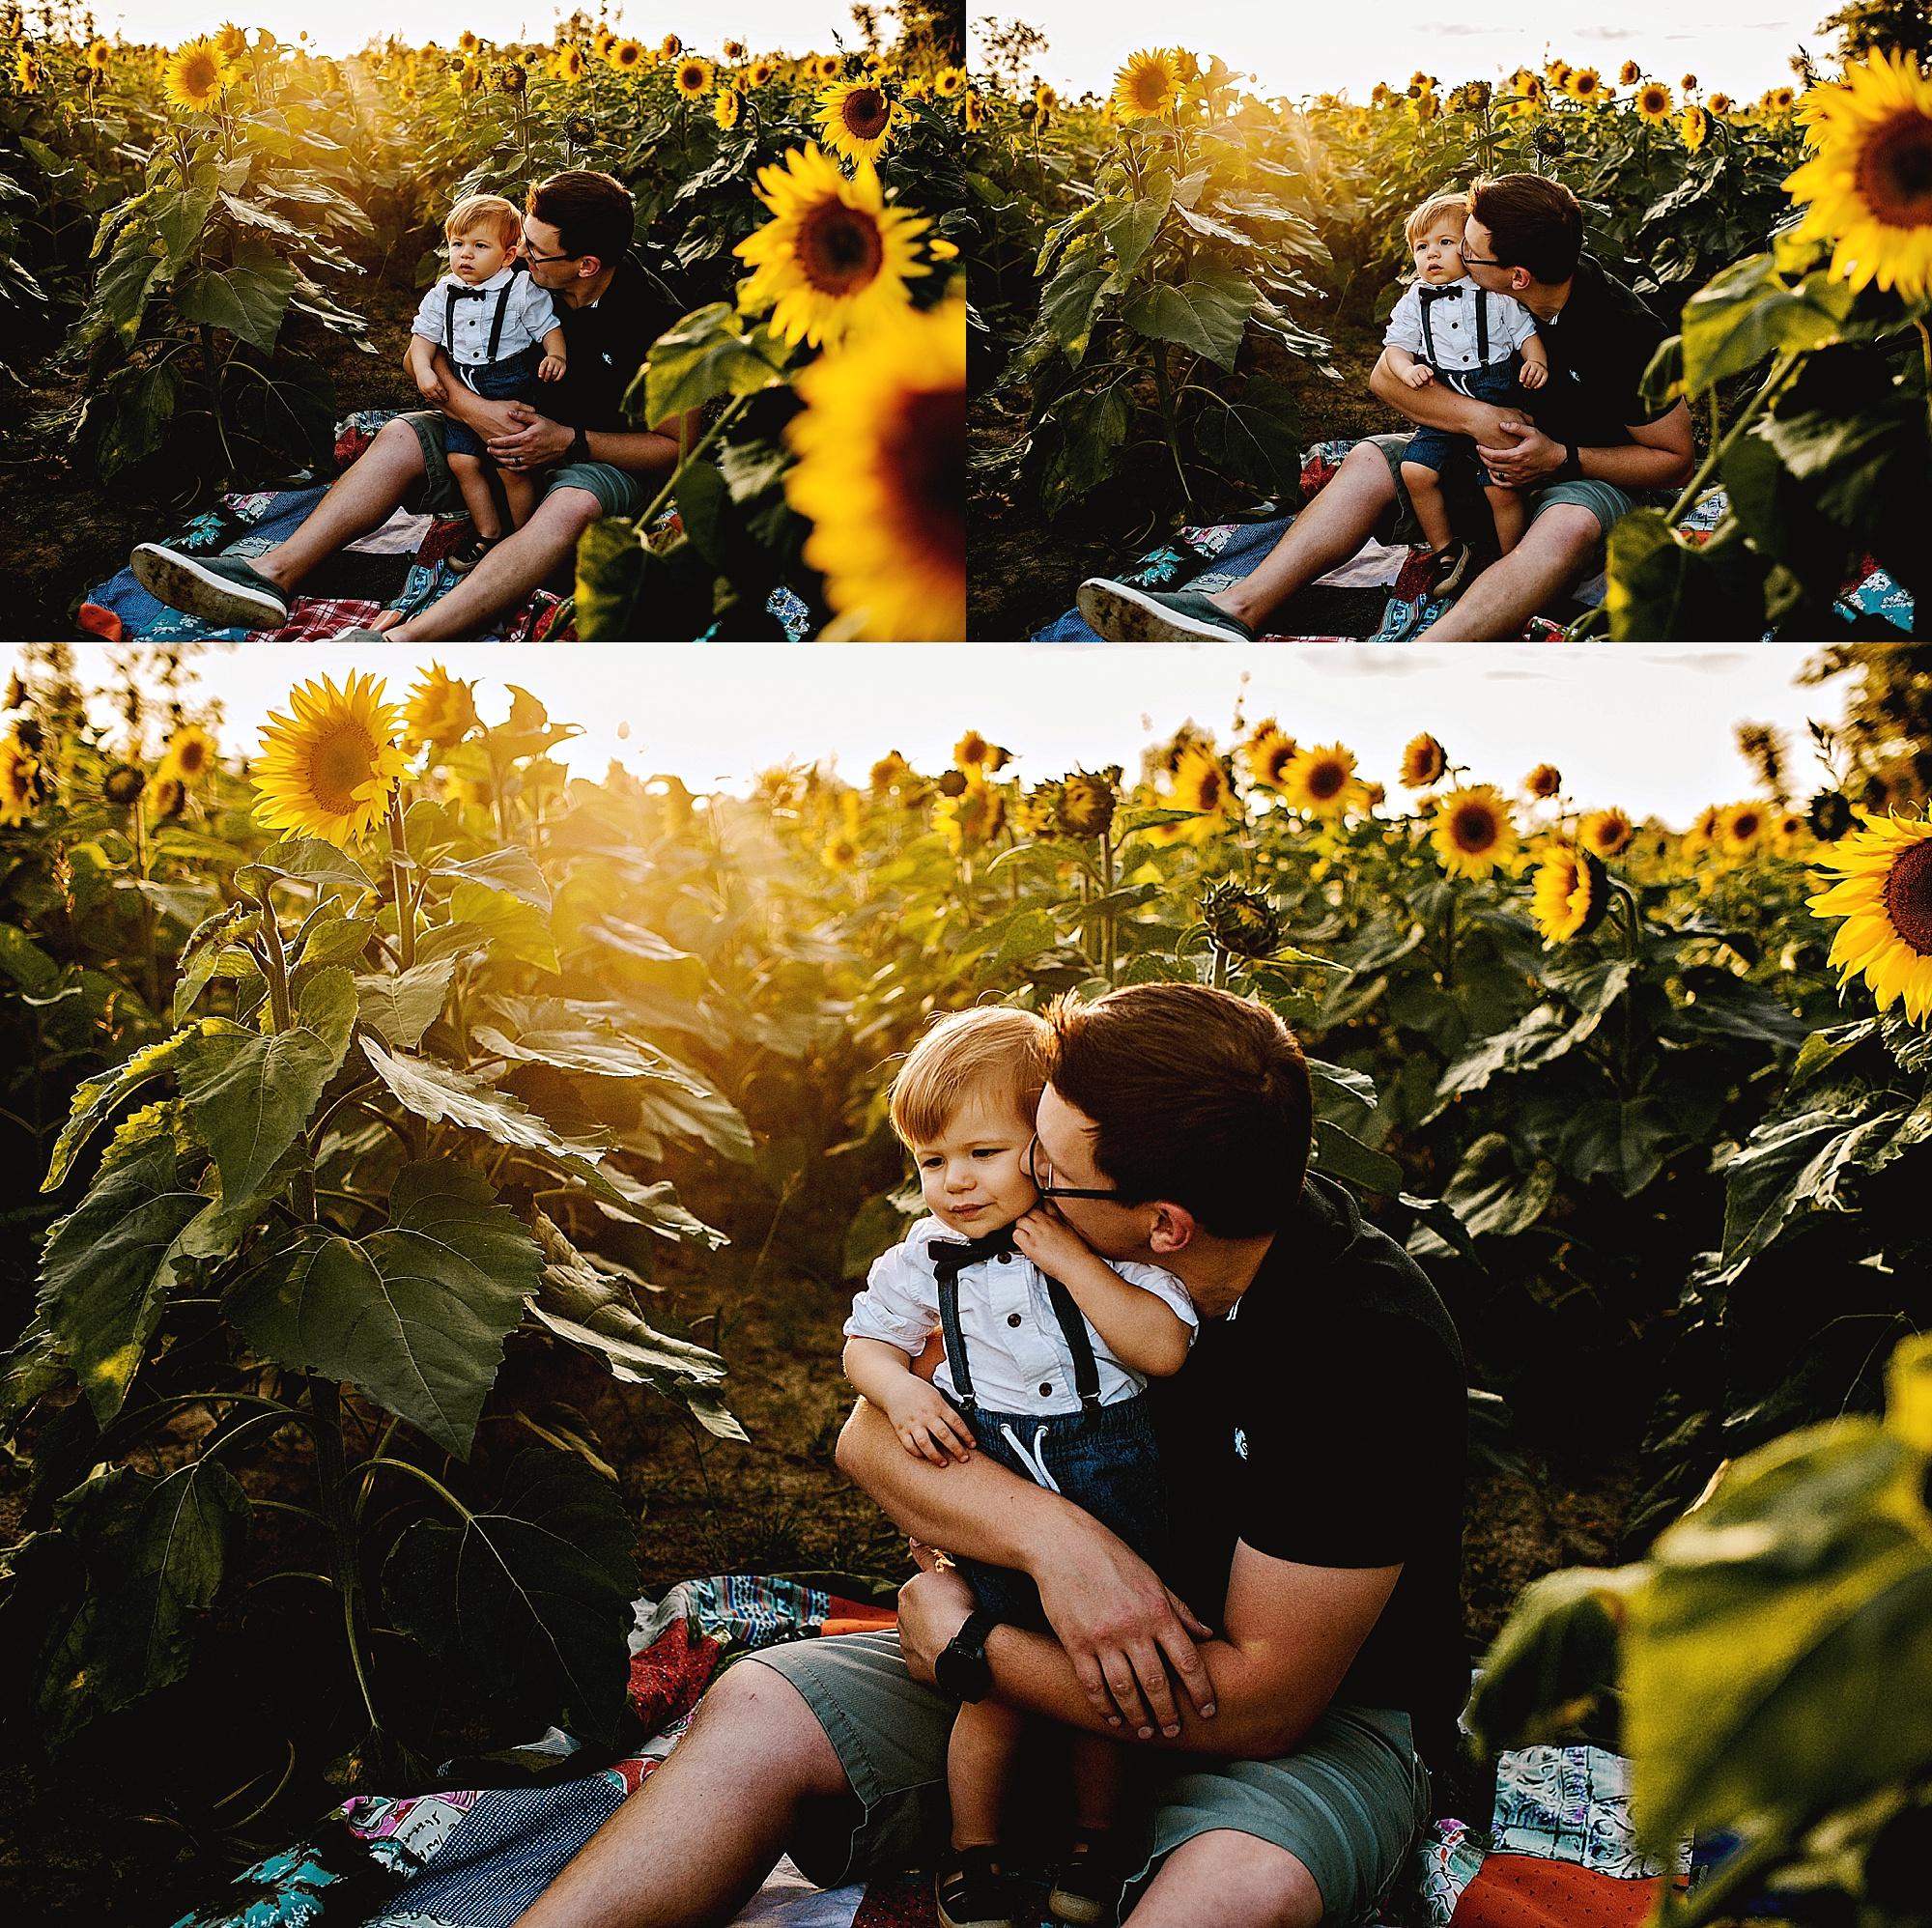 Schreiner-family-lauren-grayson-cleveland-photographer-sunflower-field-session_0012.jpg